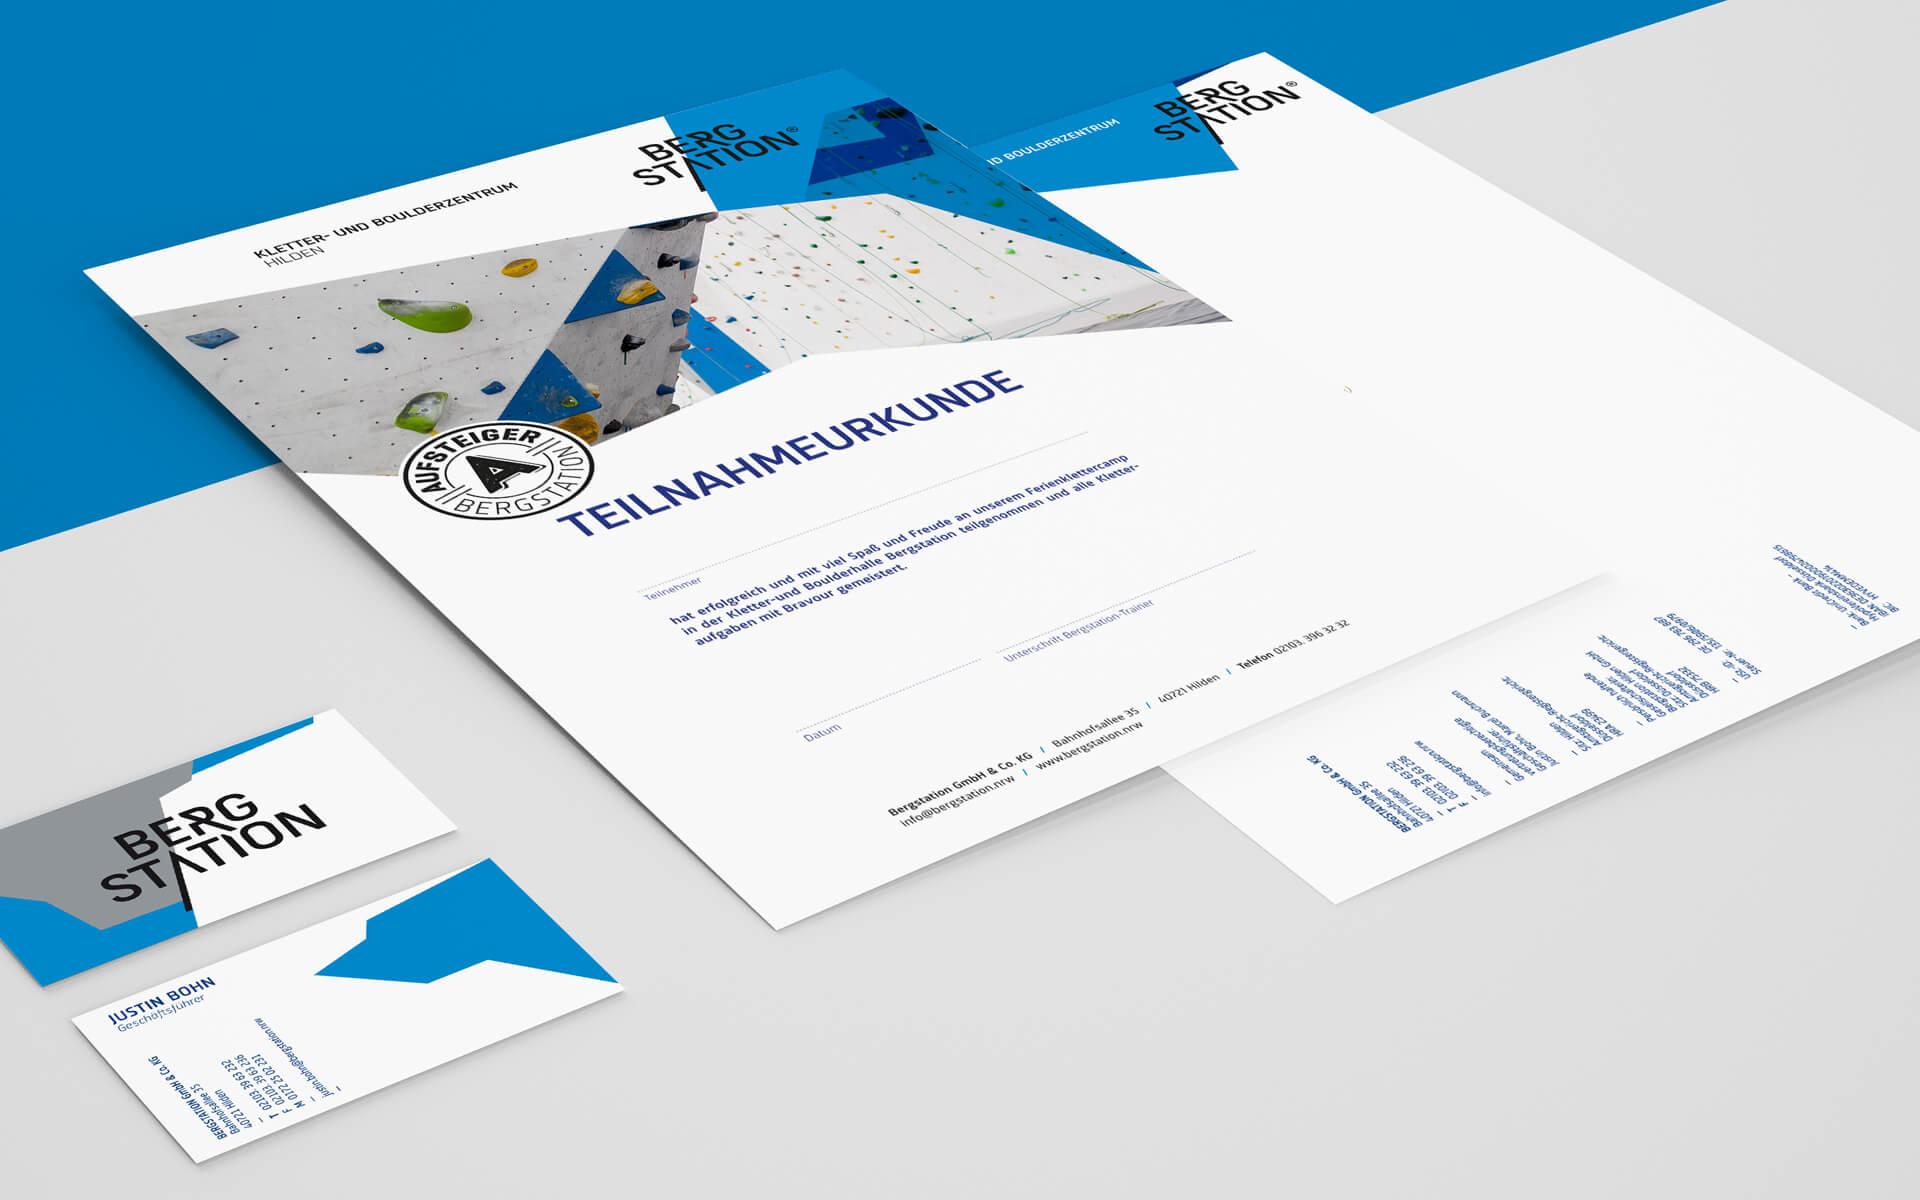 Bergstation Corporate Design, Urkunde